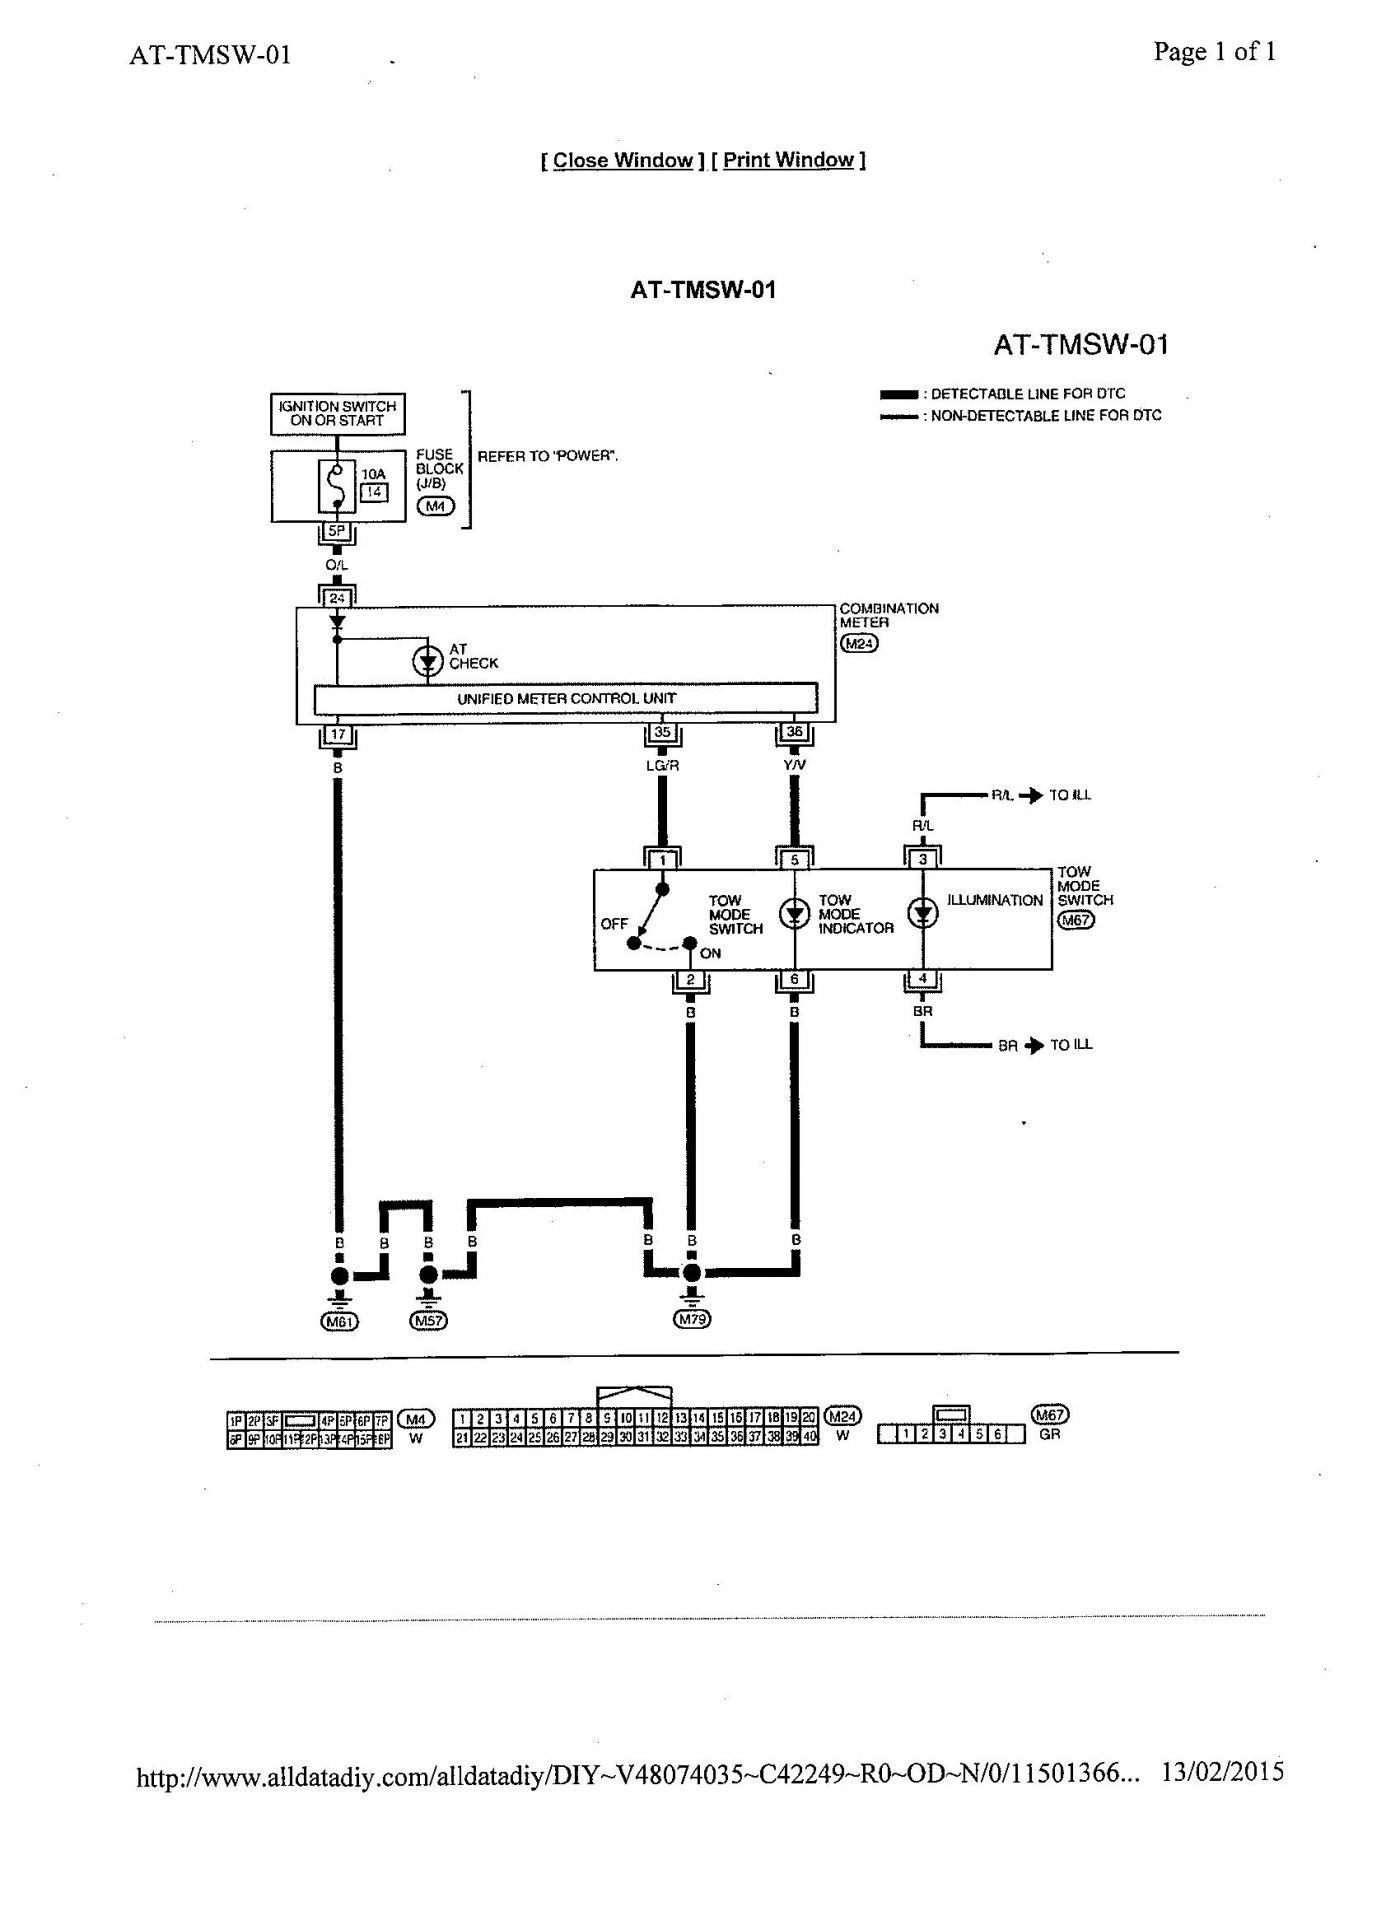 Best Of Dpst Rocker Switch Wiring Diagram In 2020